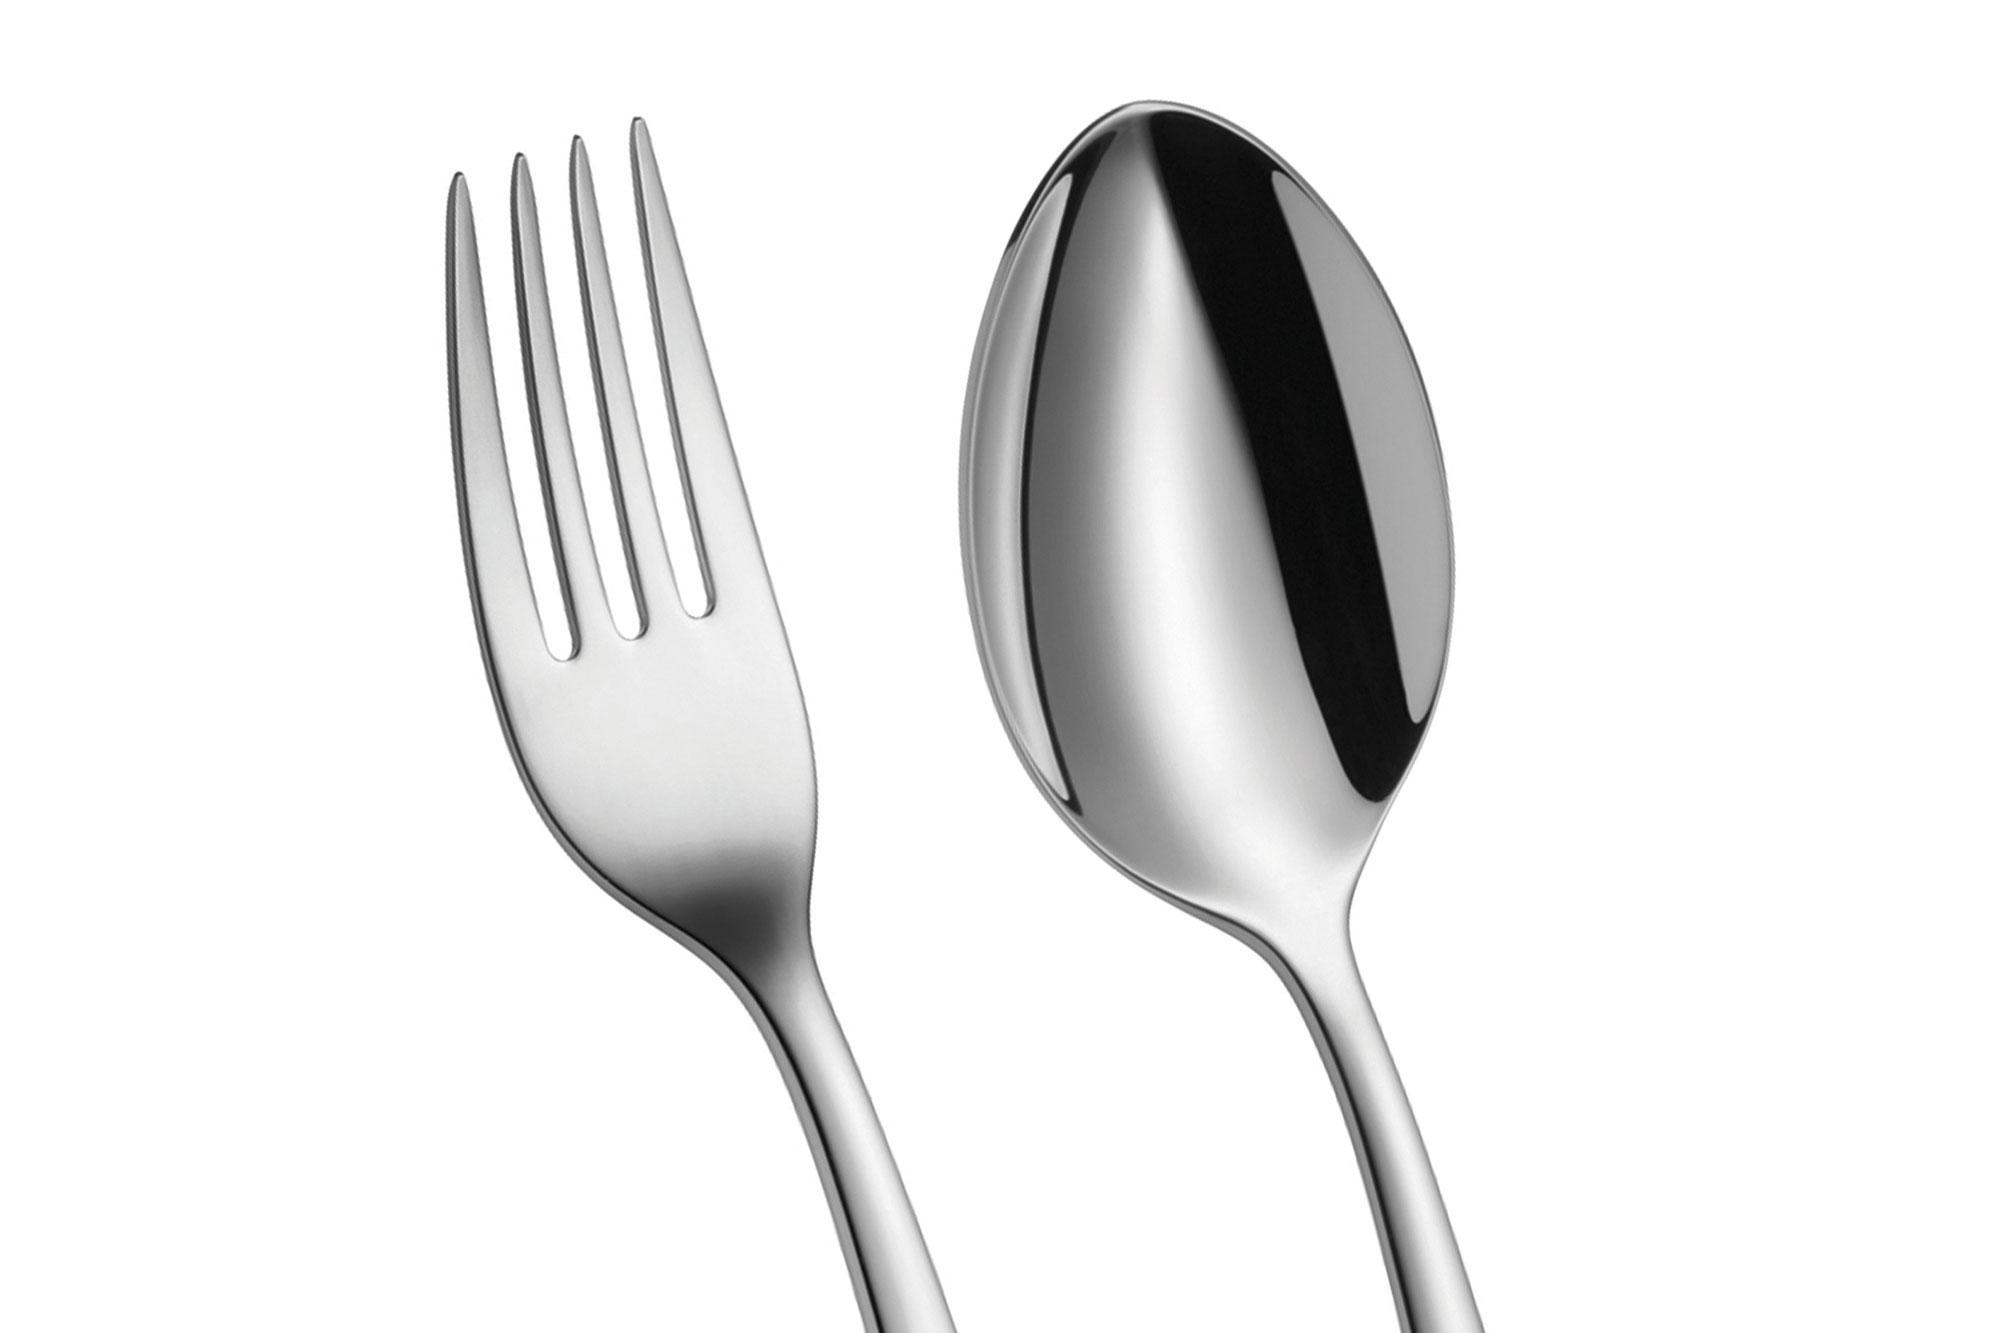 Wmf juwel stainless steel flatware set 20 piece cutlery and more - Wmf silverware ...